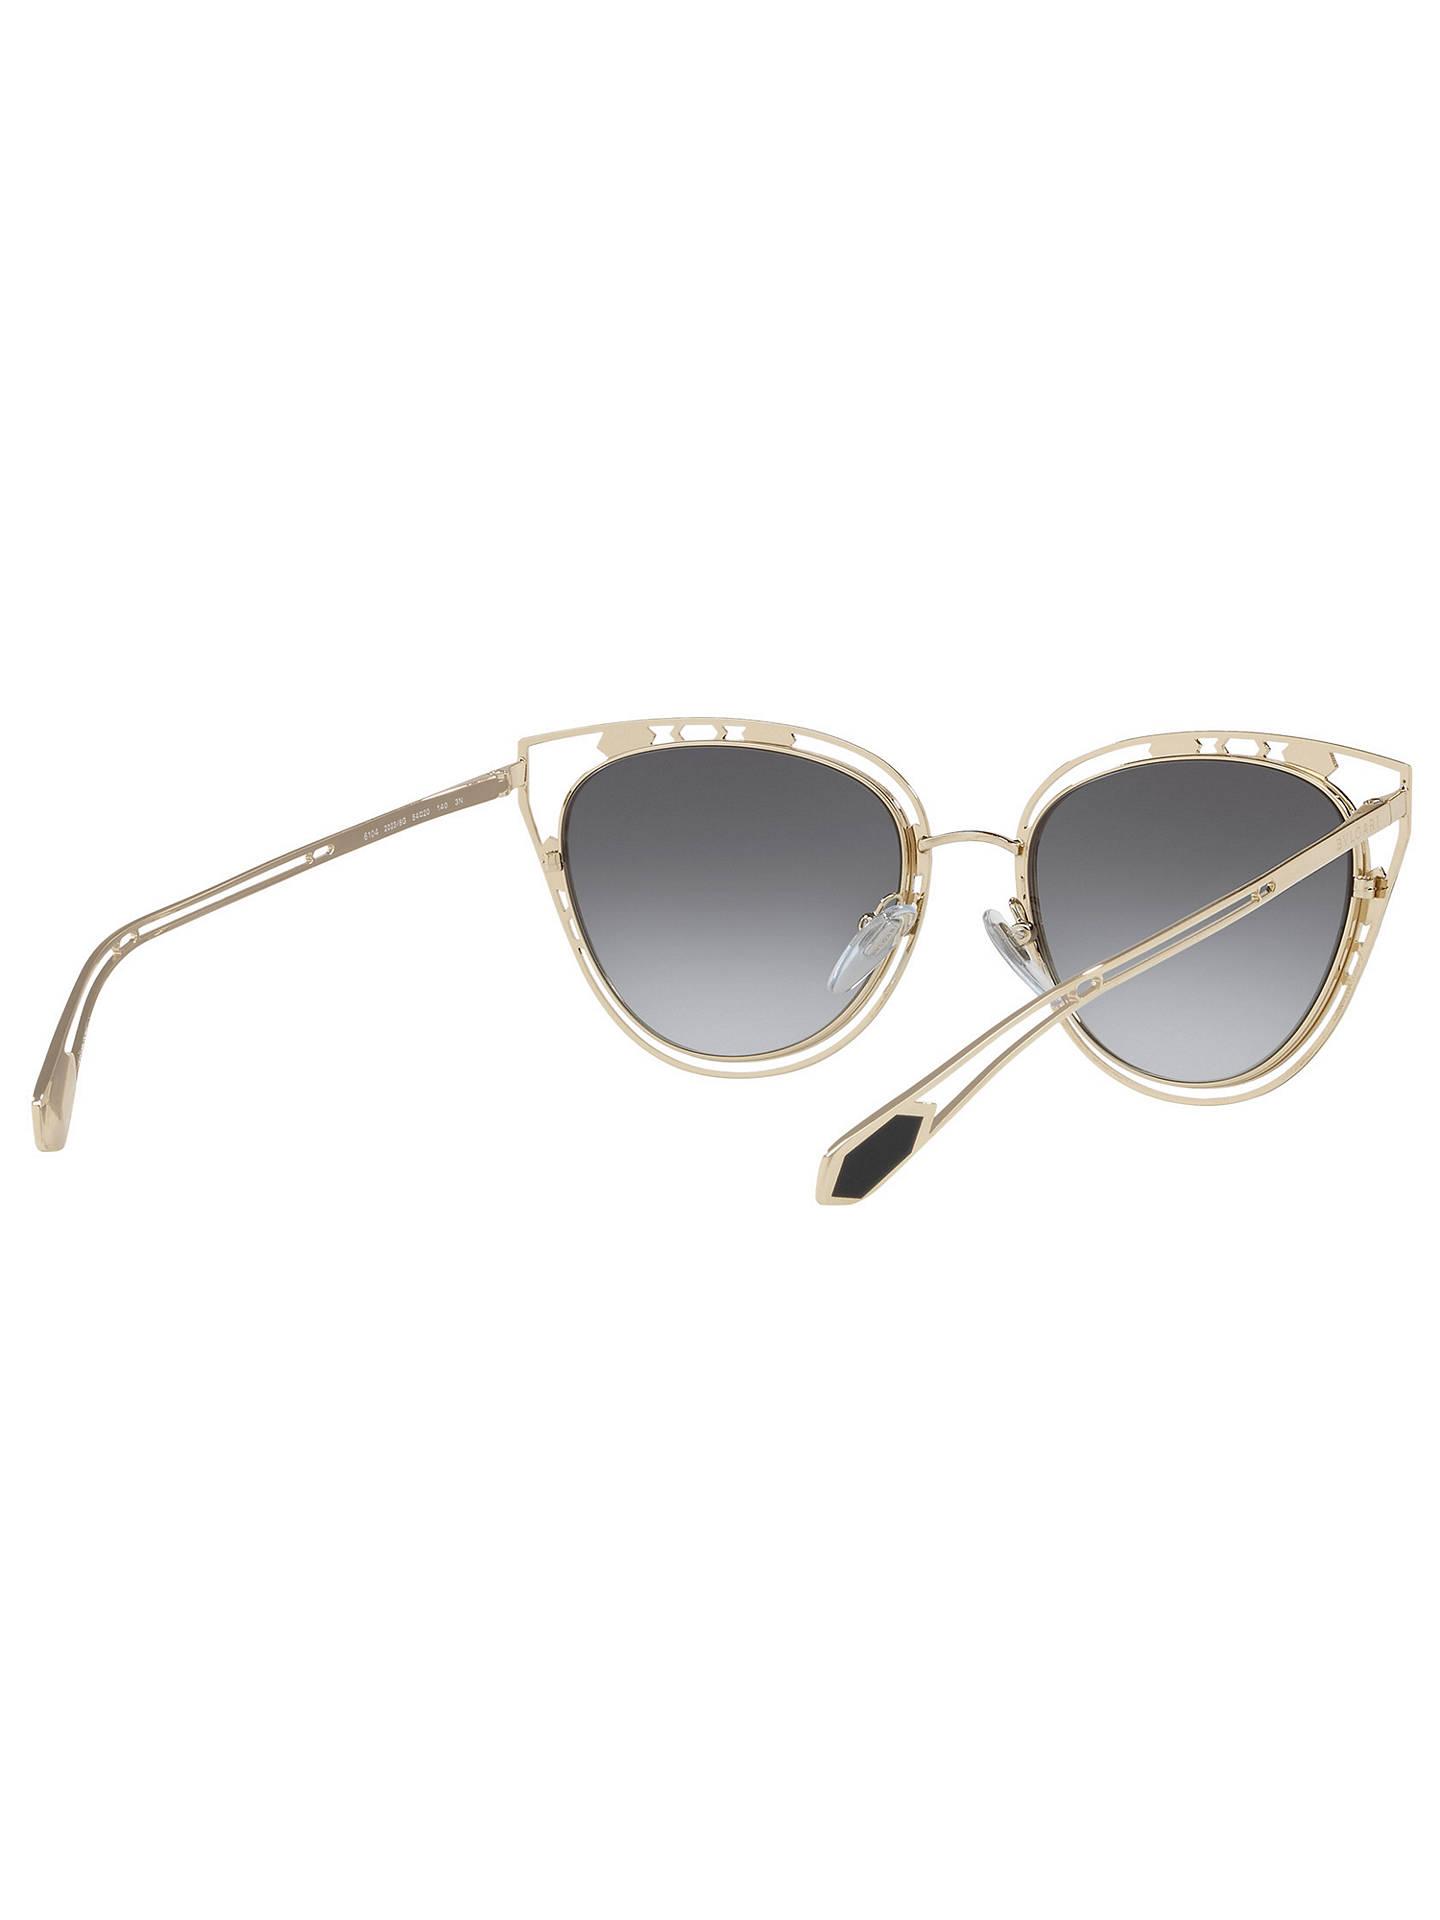 234323c0f86 BVLGARI BV6104 Women s Cat s Eyes Sunglasses at John Lewis   Partners